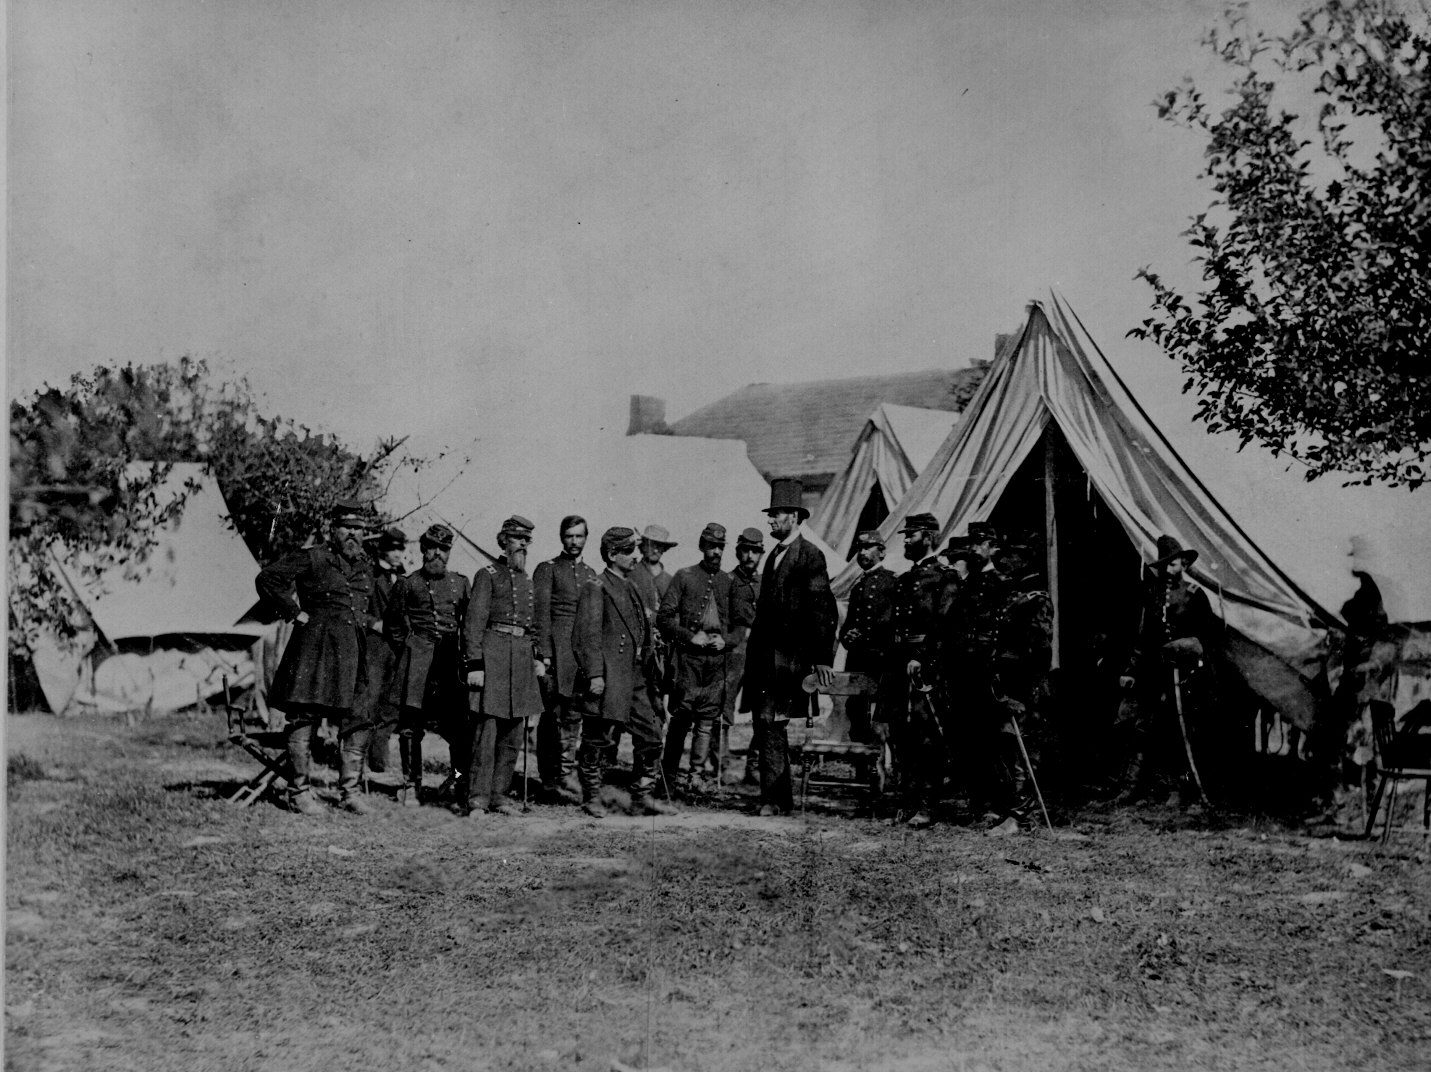 President Lincoln Visiting the battlefield at Antietam, MD